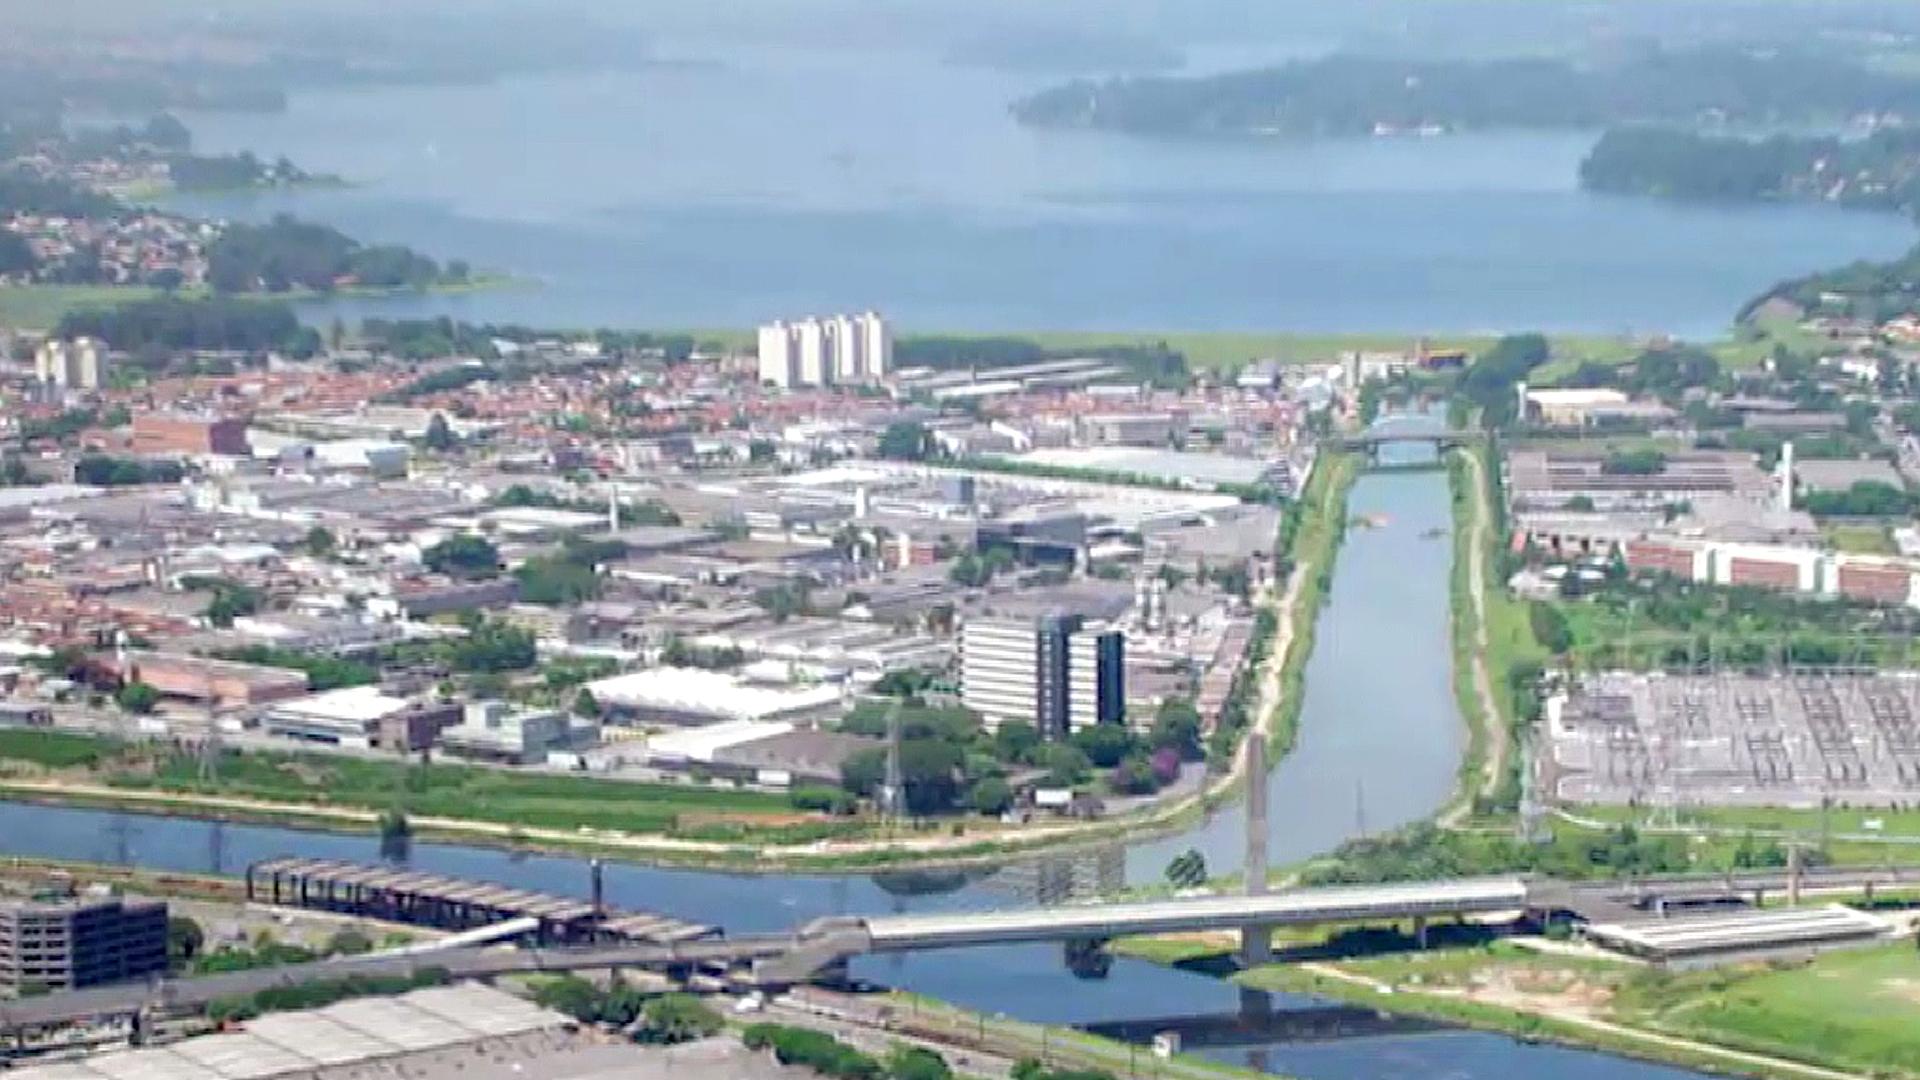 City of 9 Million Rationing Water - NBC News